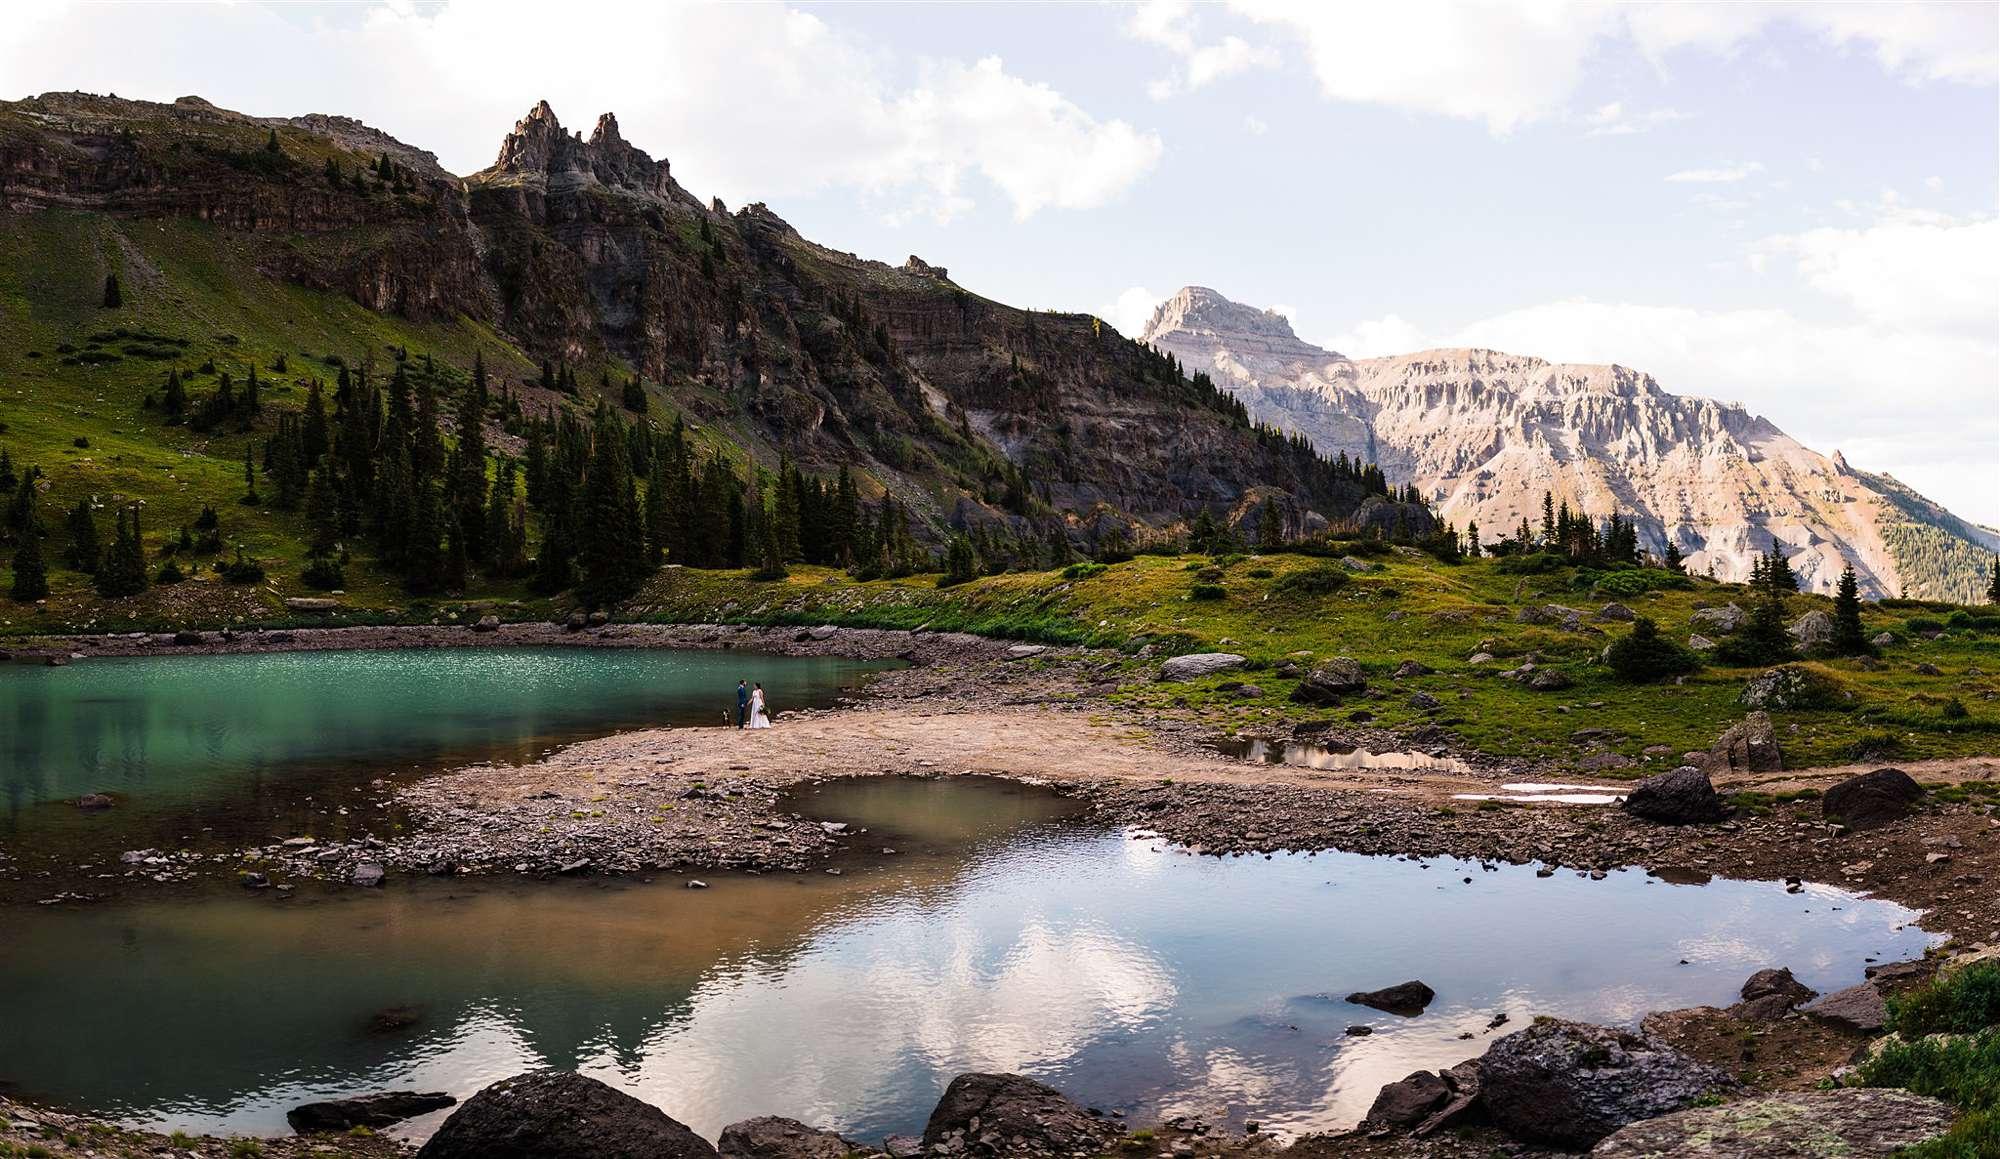 Colorado_Jeeping_Elopement_Emily_Matt_The_Foxes_Photography_0038.jpg